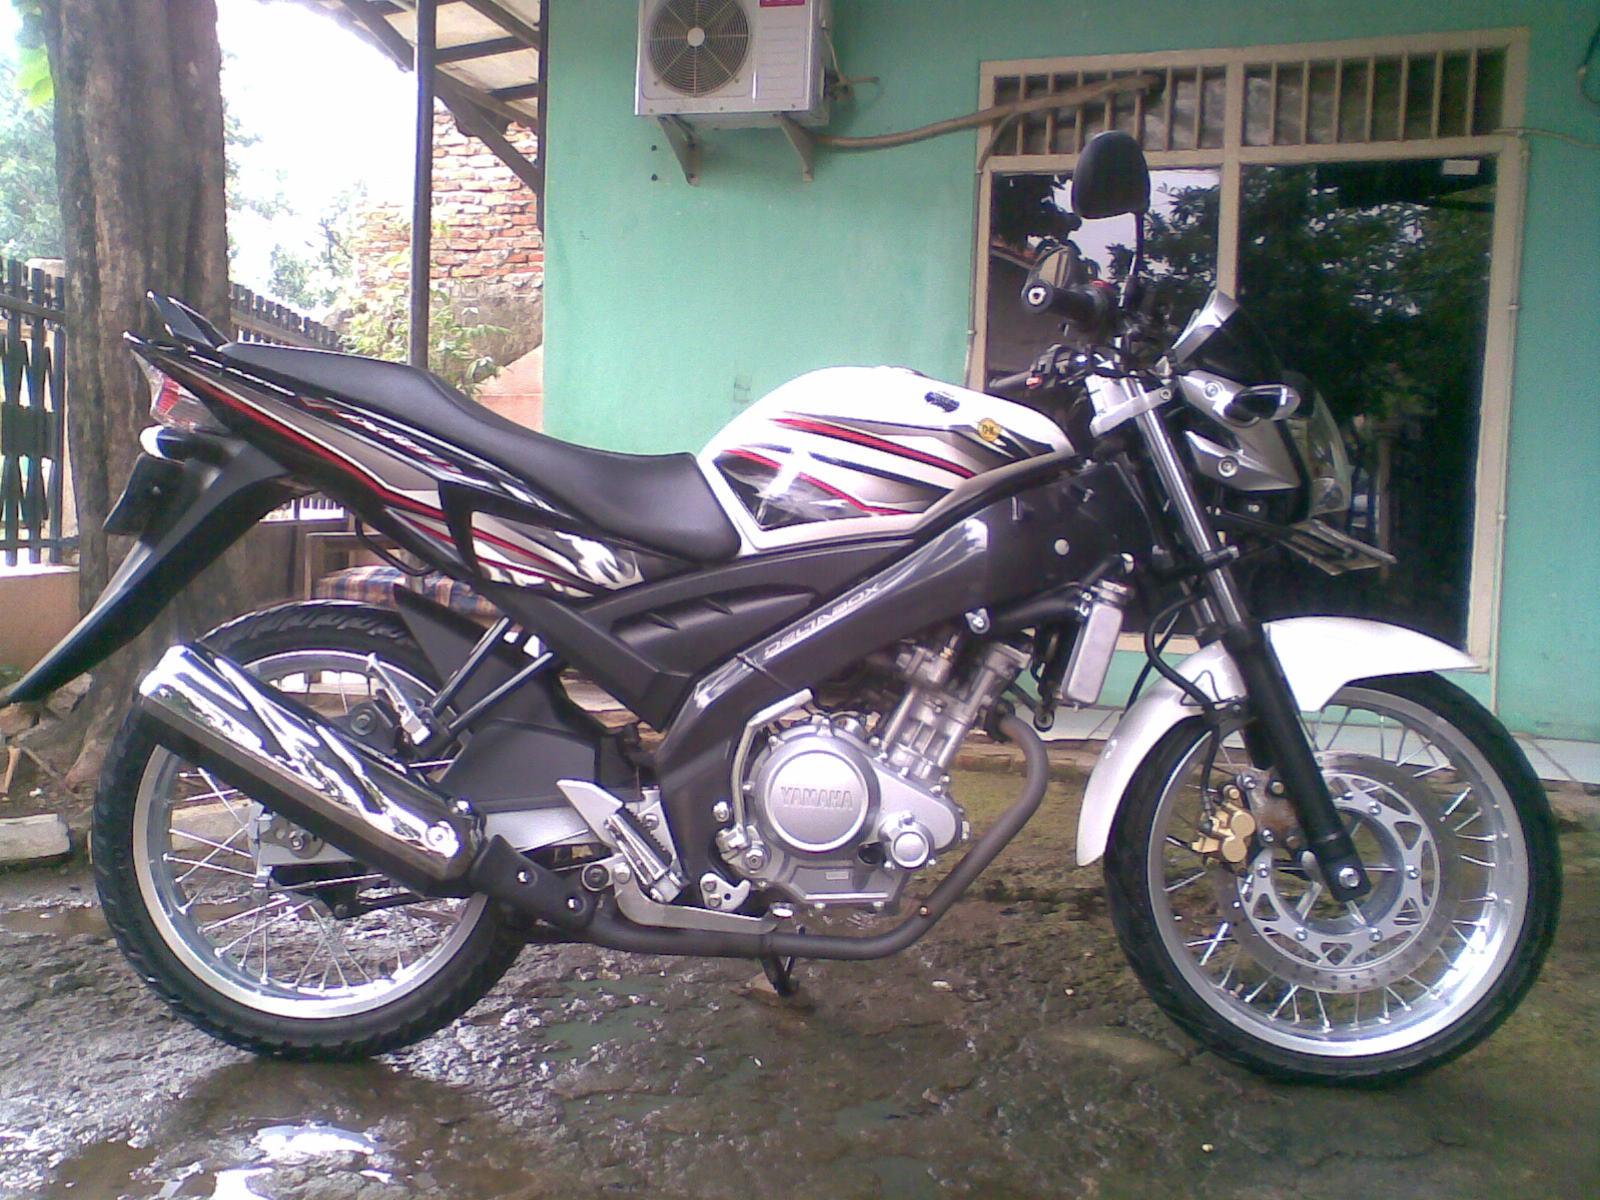 Modif Yamaha Vixion Warna Putih